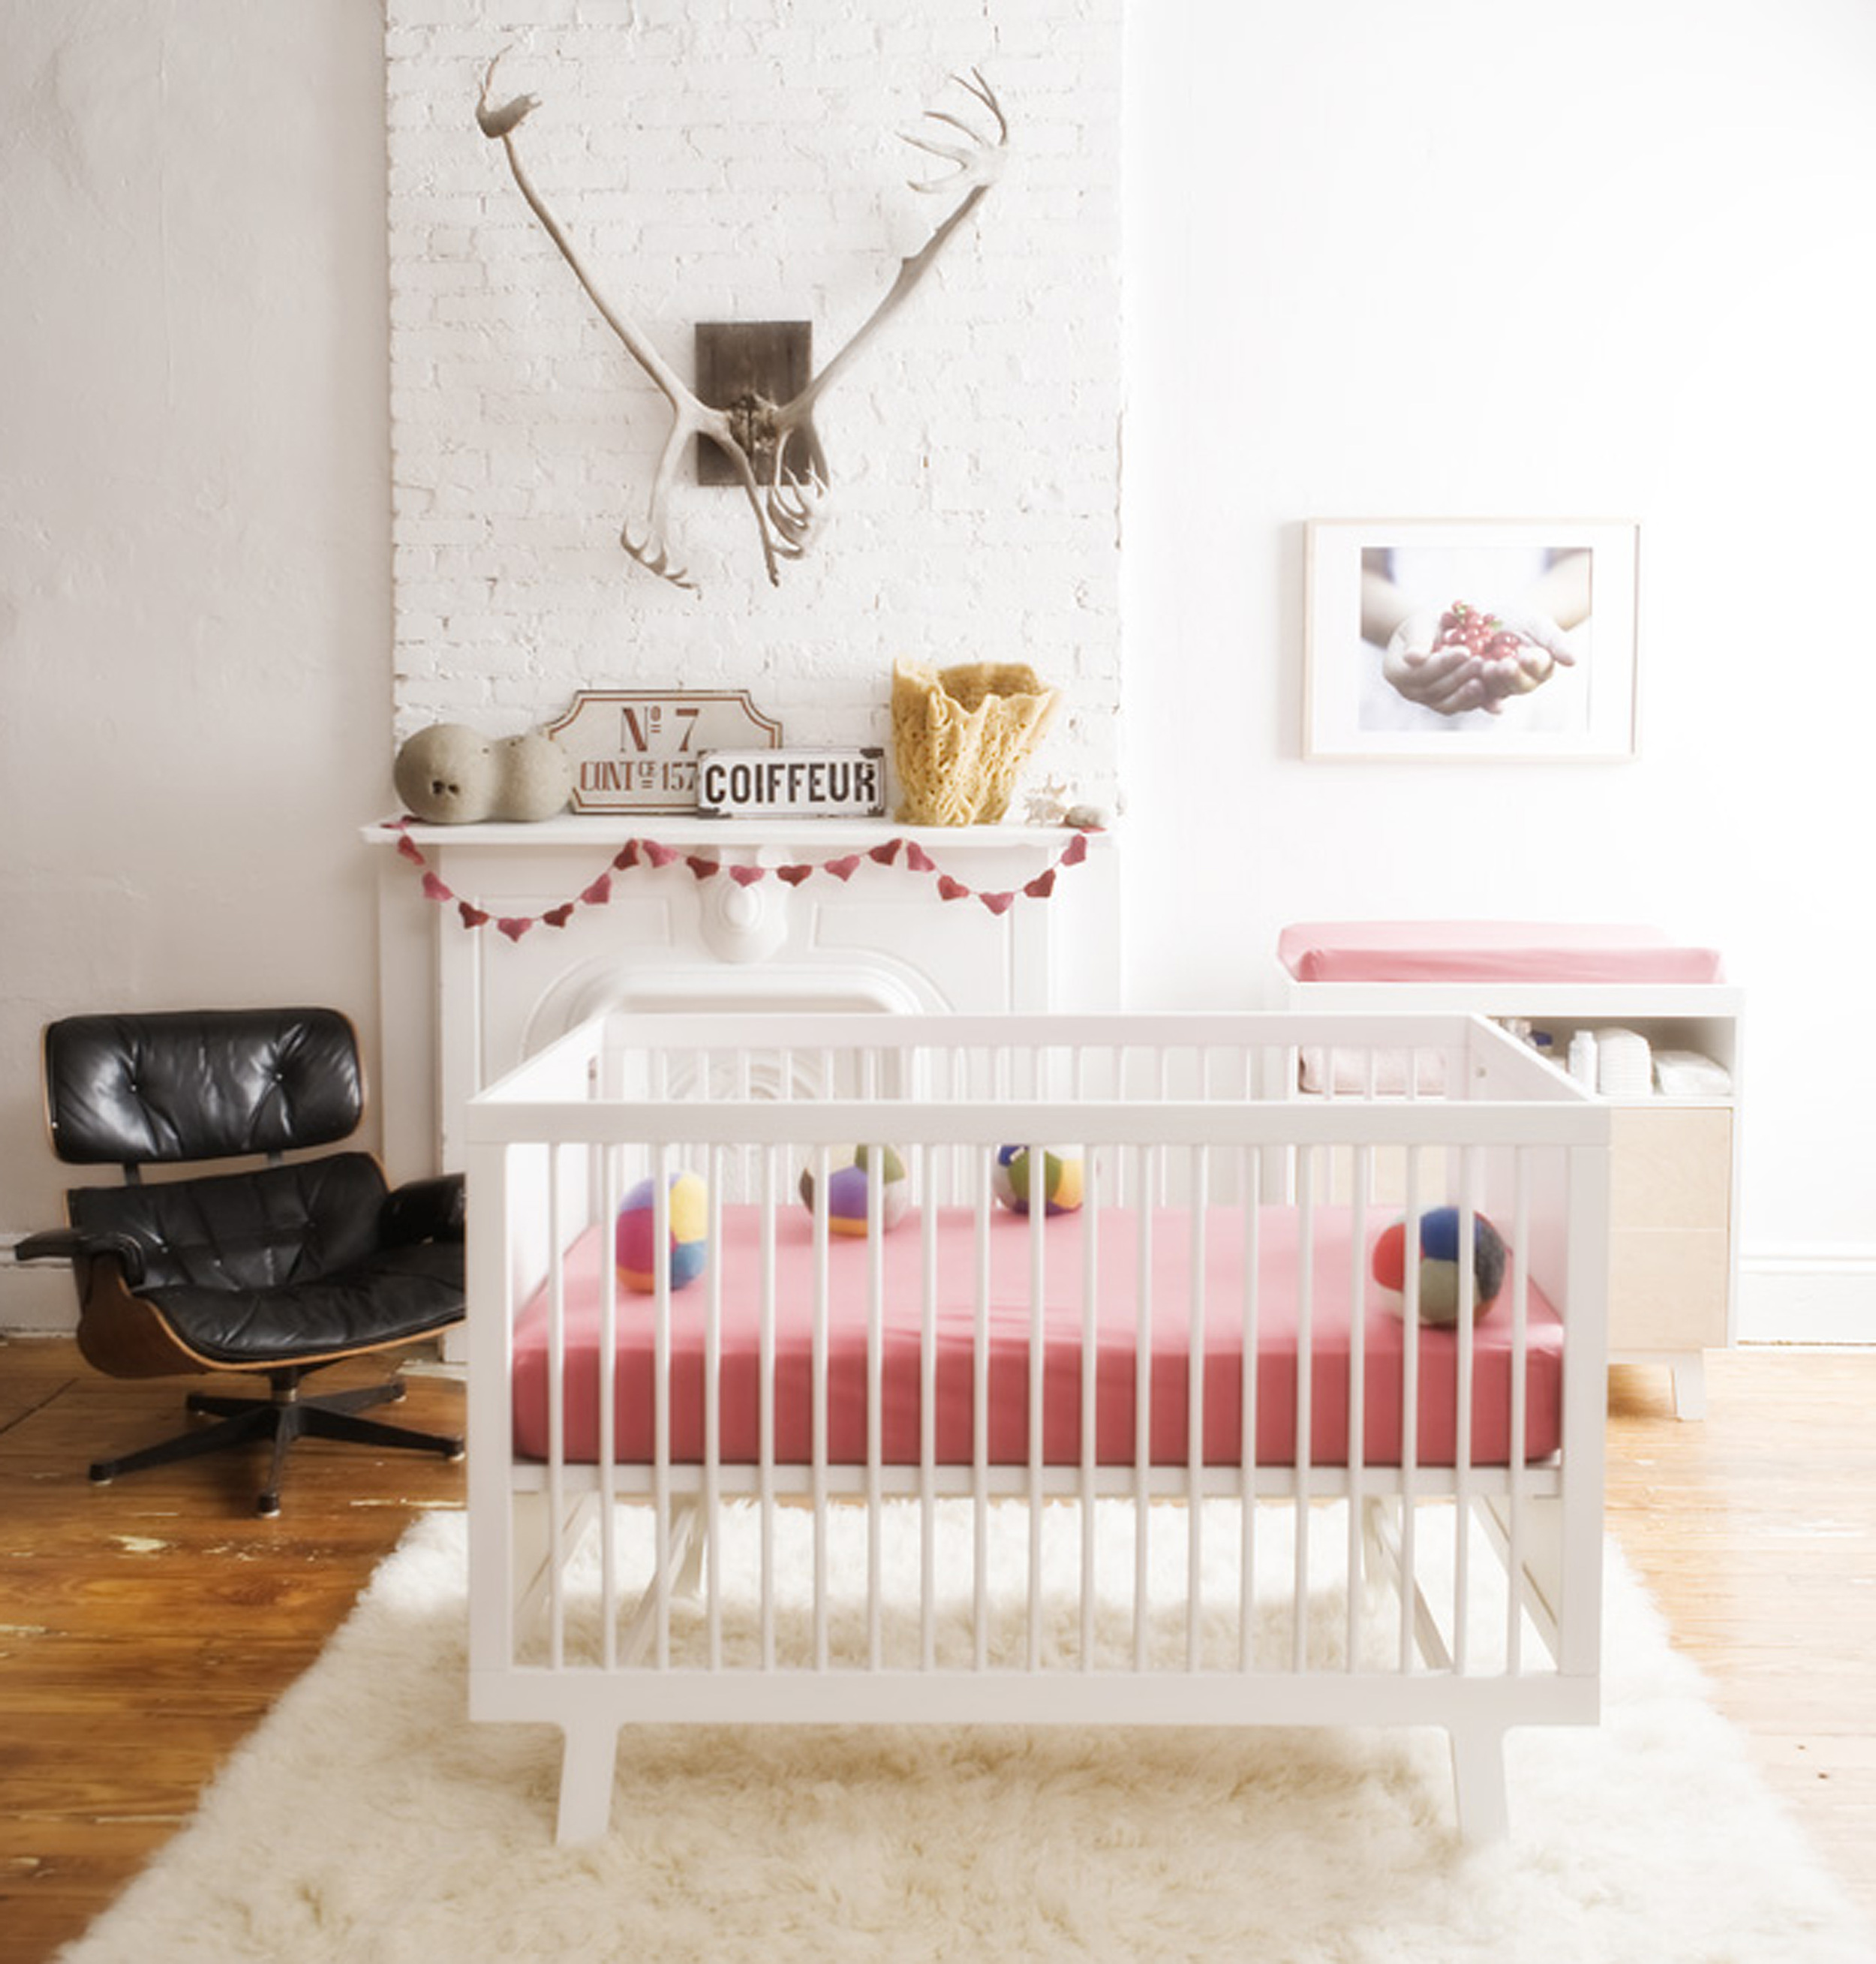 {swim images via  OeufNYC  // nursery images via  babycubby  // Shoptadpole //  Project Nursery }